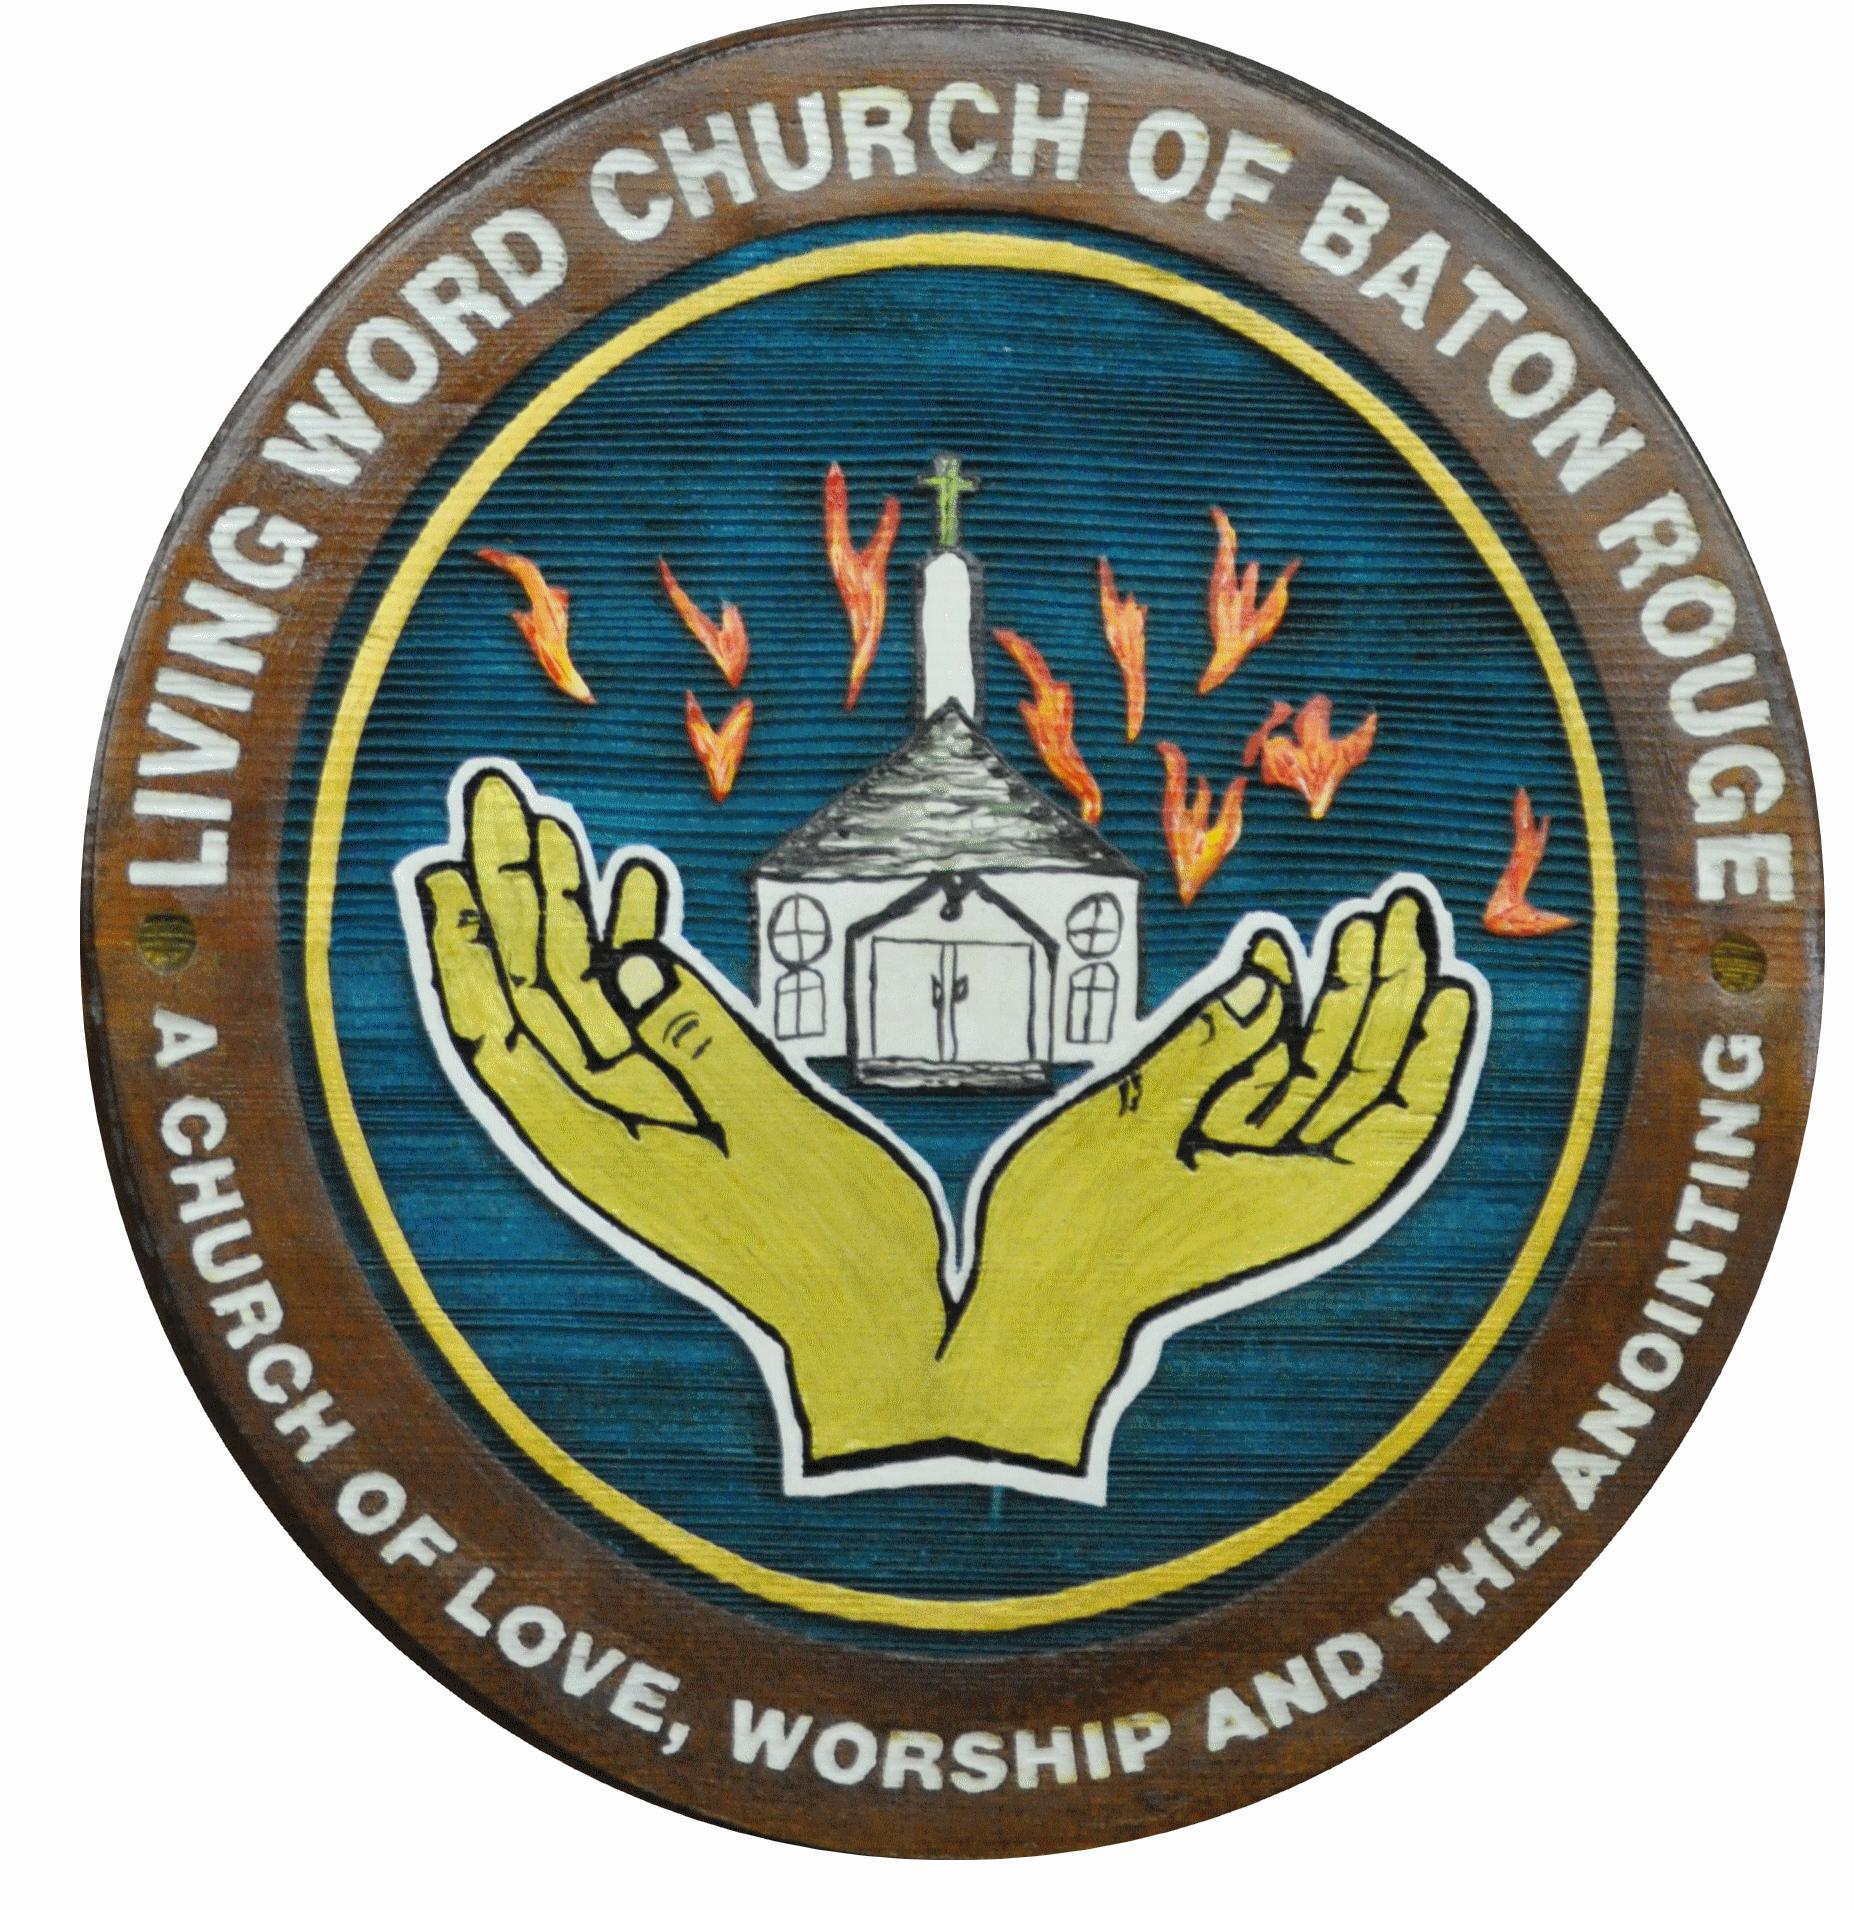 LIVING WORD CHURCH of Baton Rouge